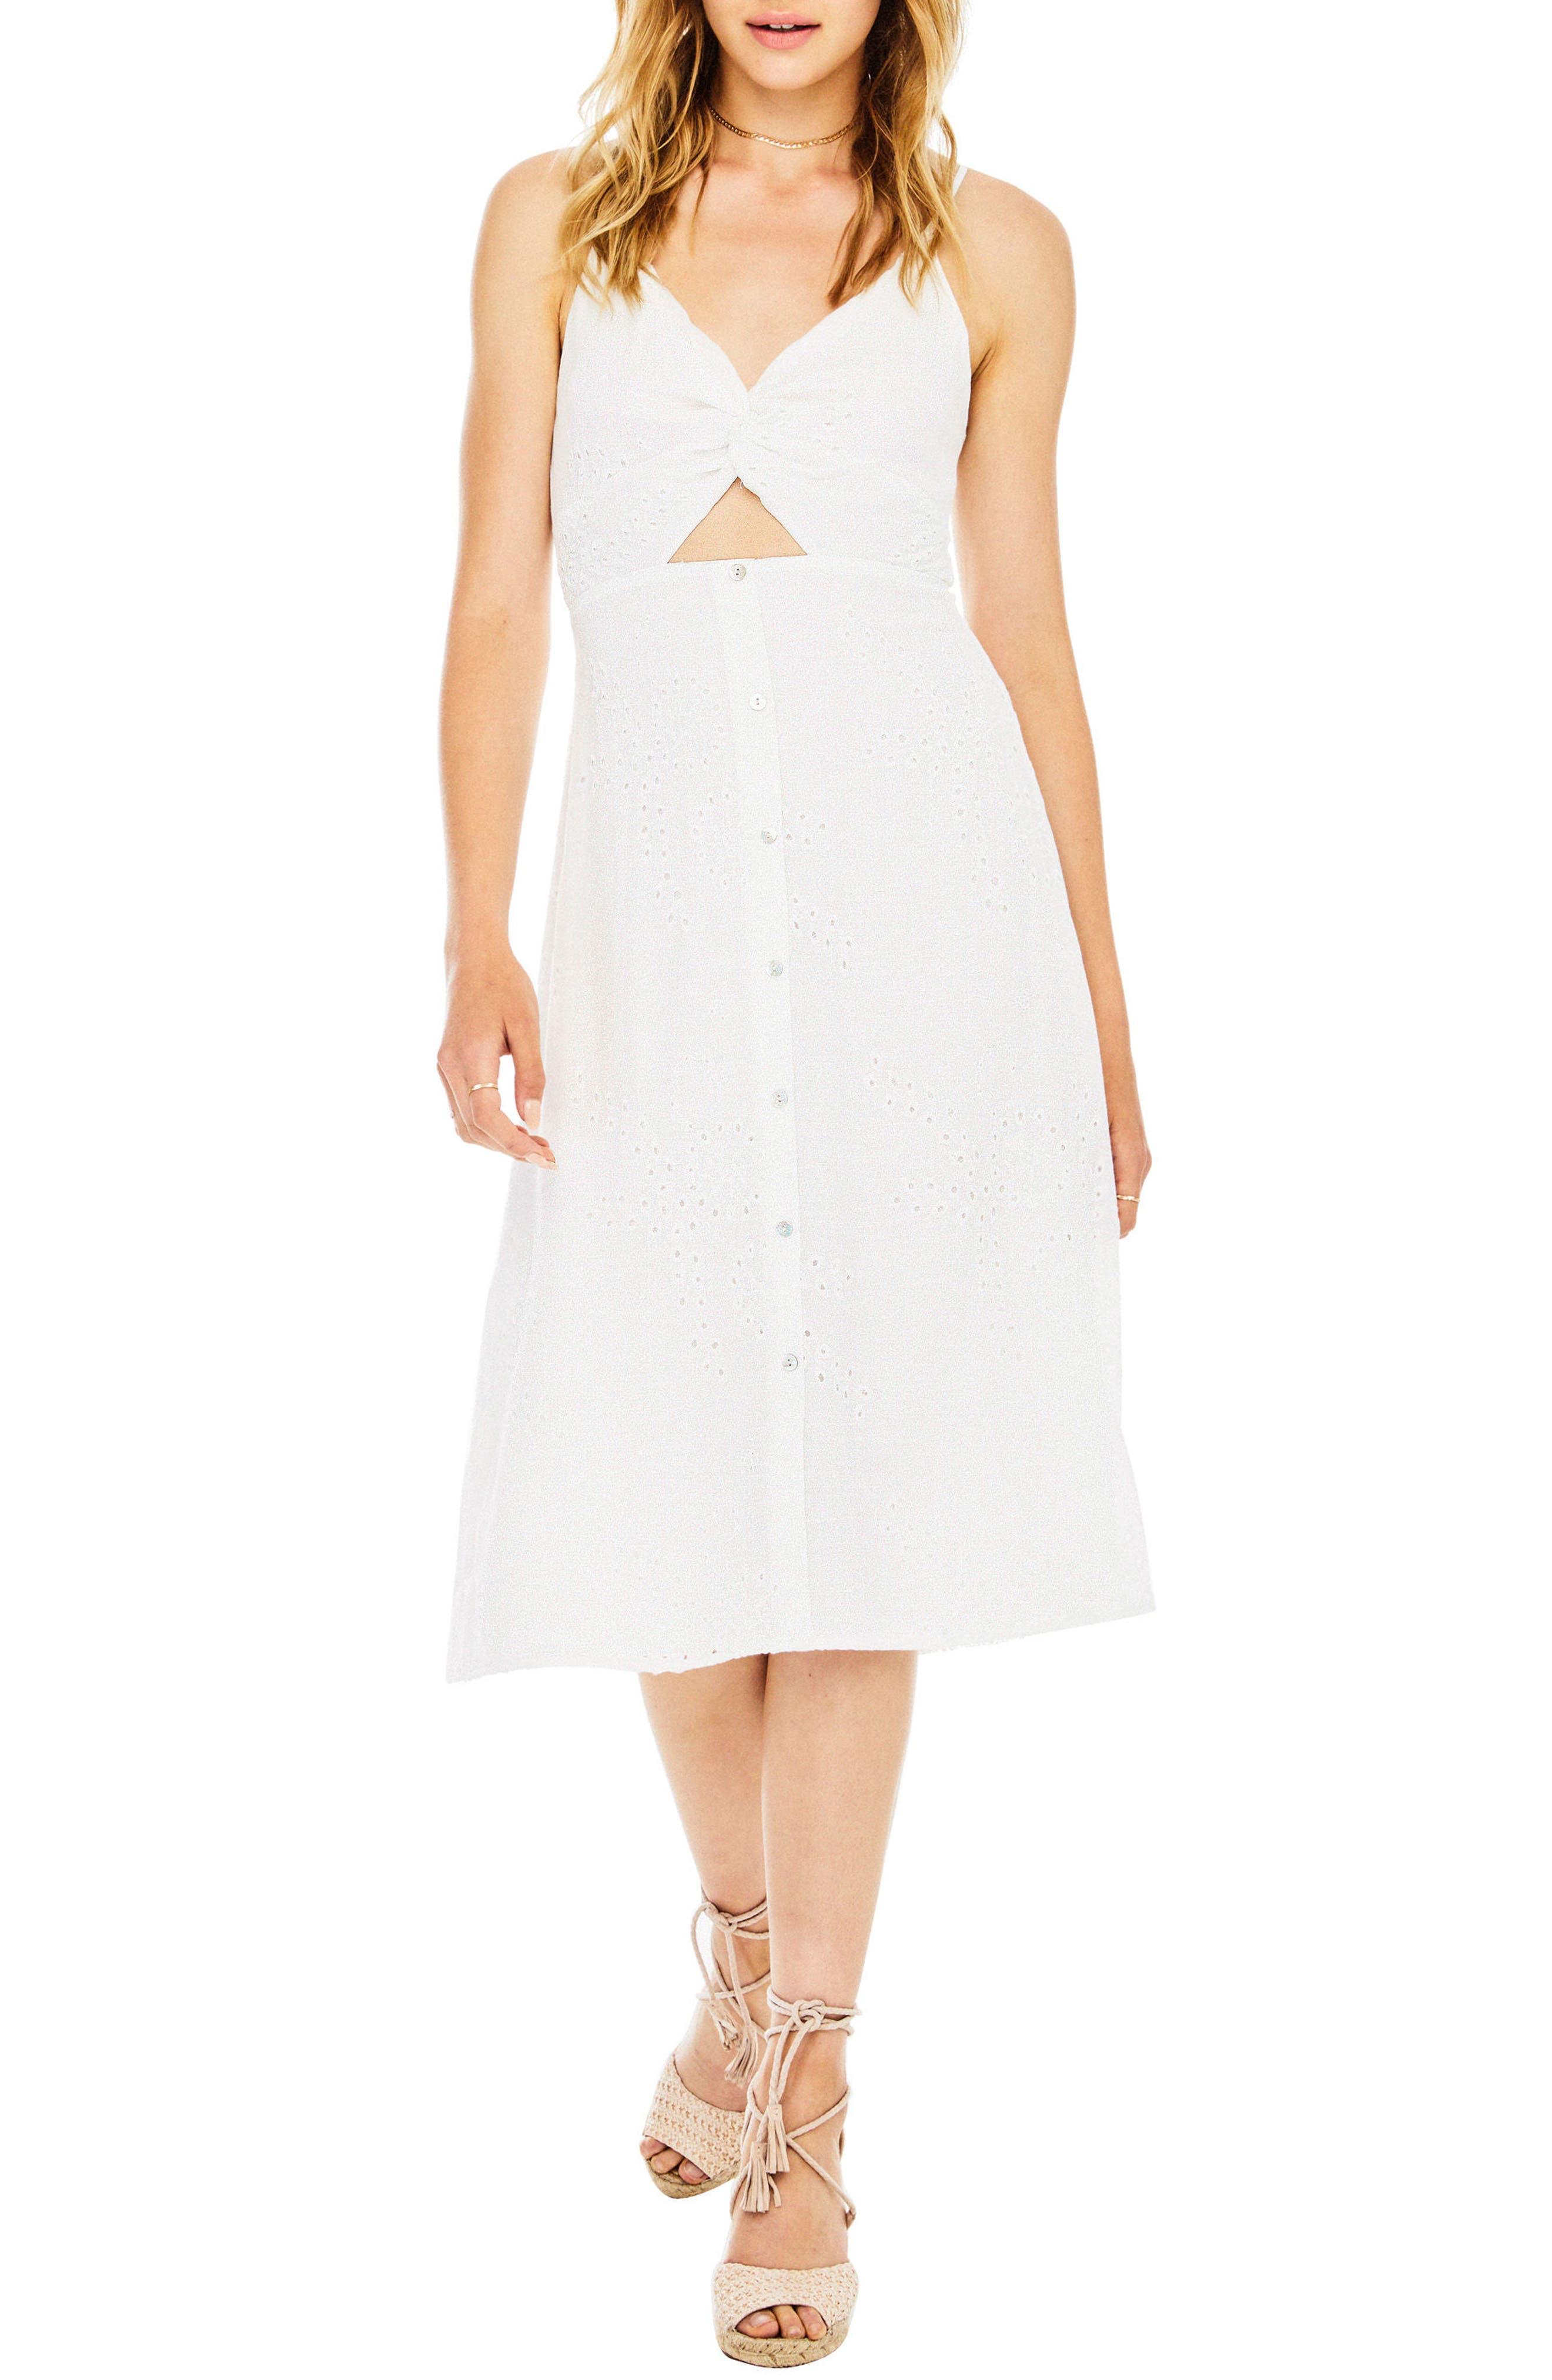 ASTR THE LABEL Ellowyn Dress, Main, color, 100